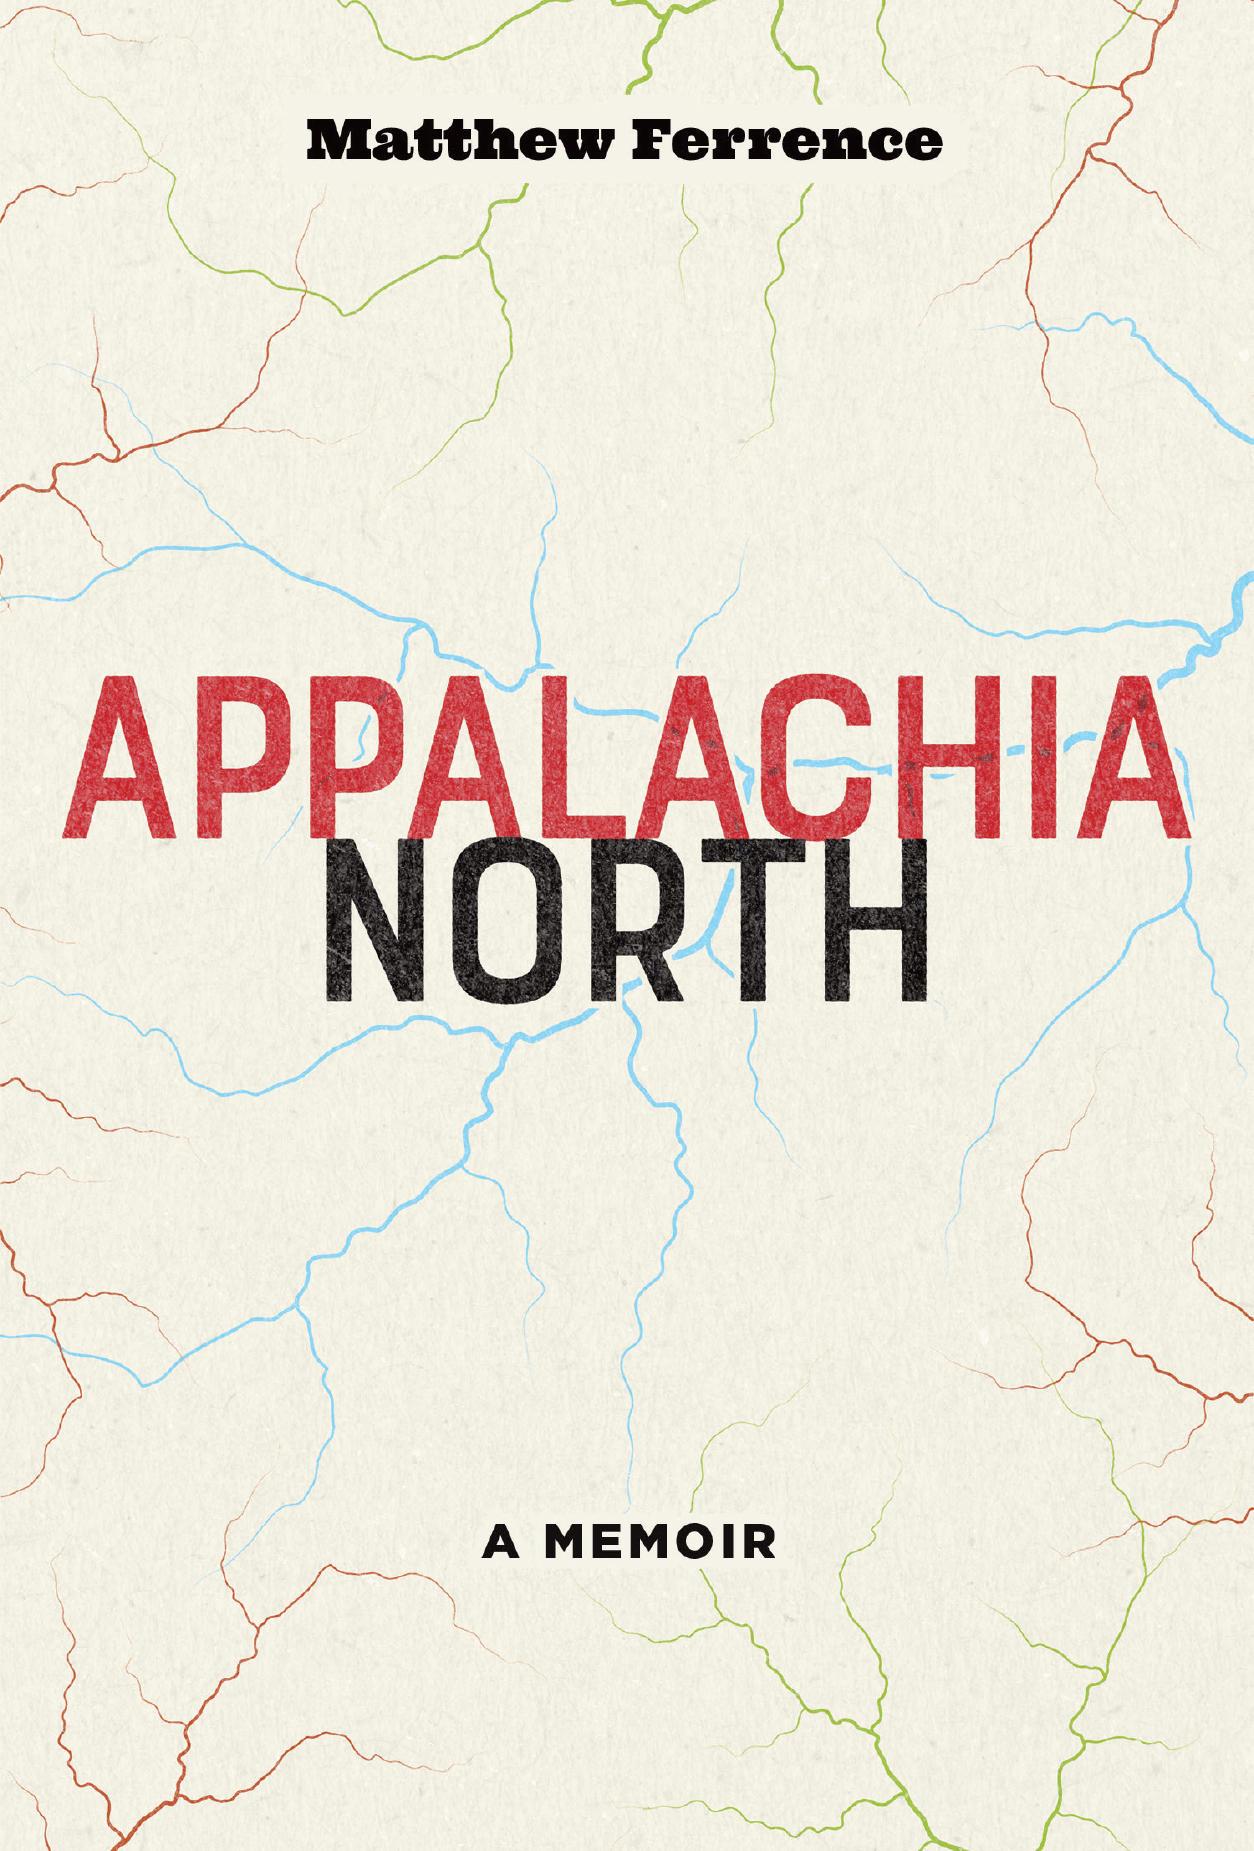 Memoir Looks At Being Appalachian North of the Mason Dixon Line | WMKY